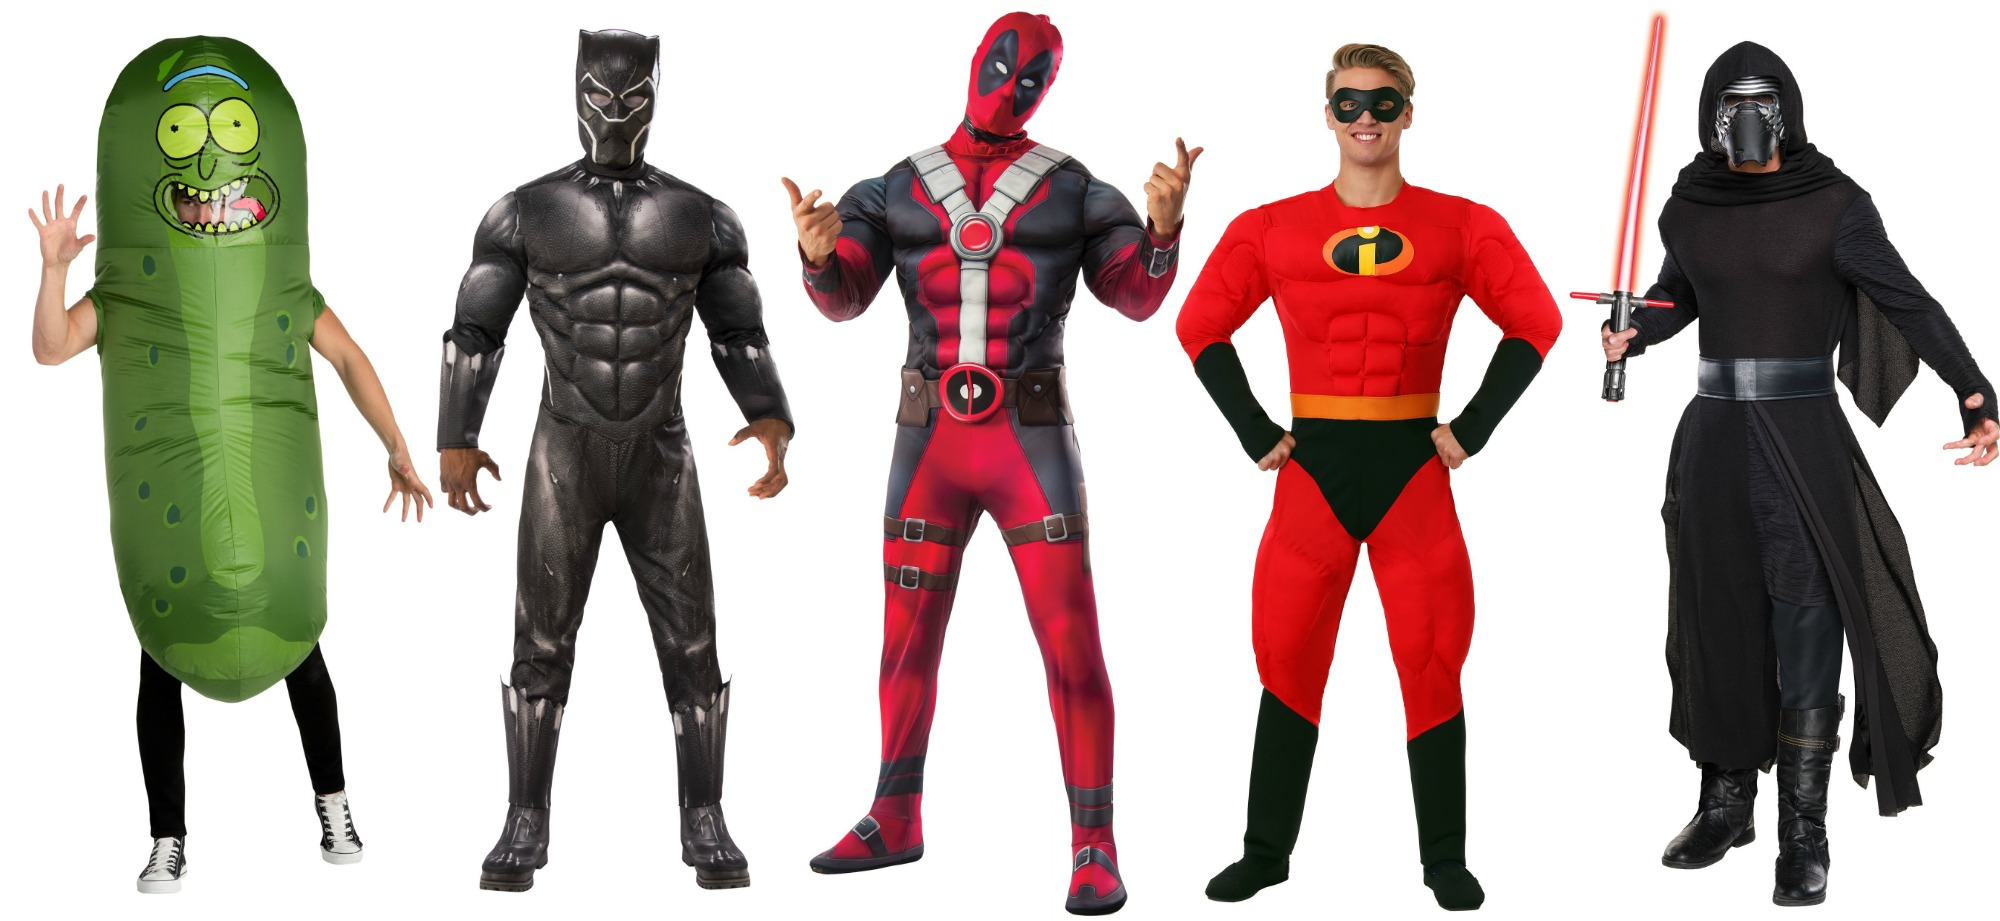 Halloween Dress Up for Men